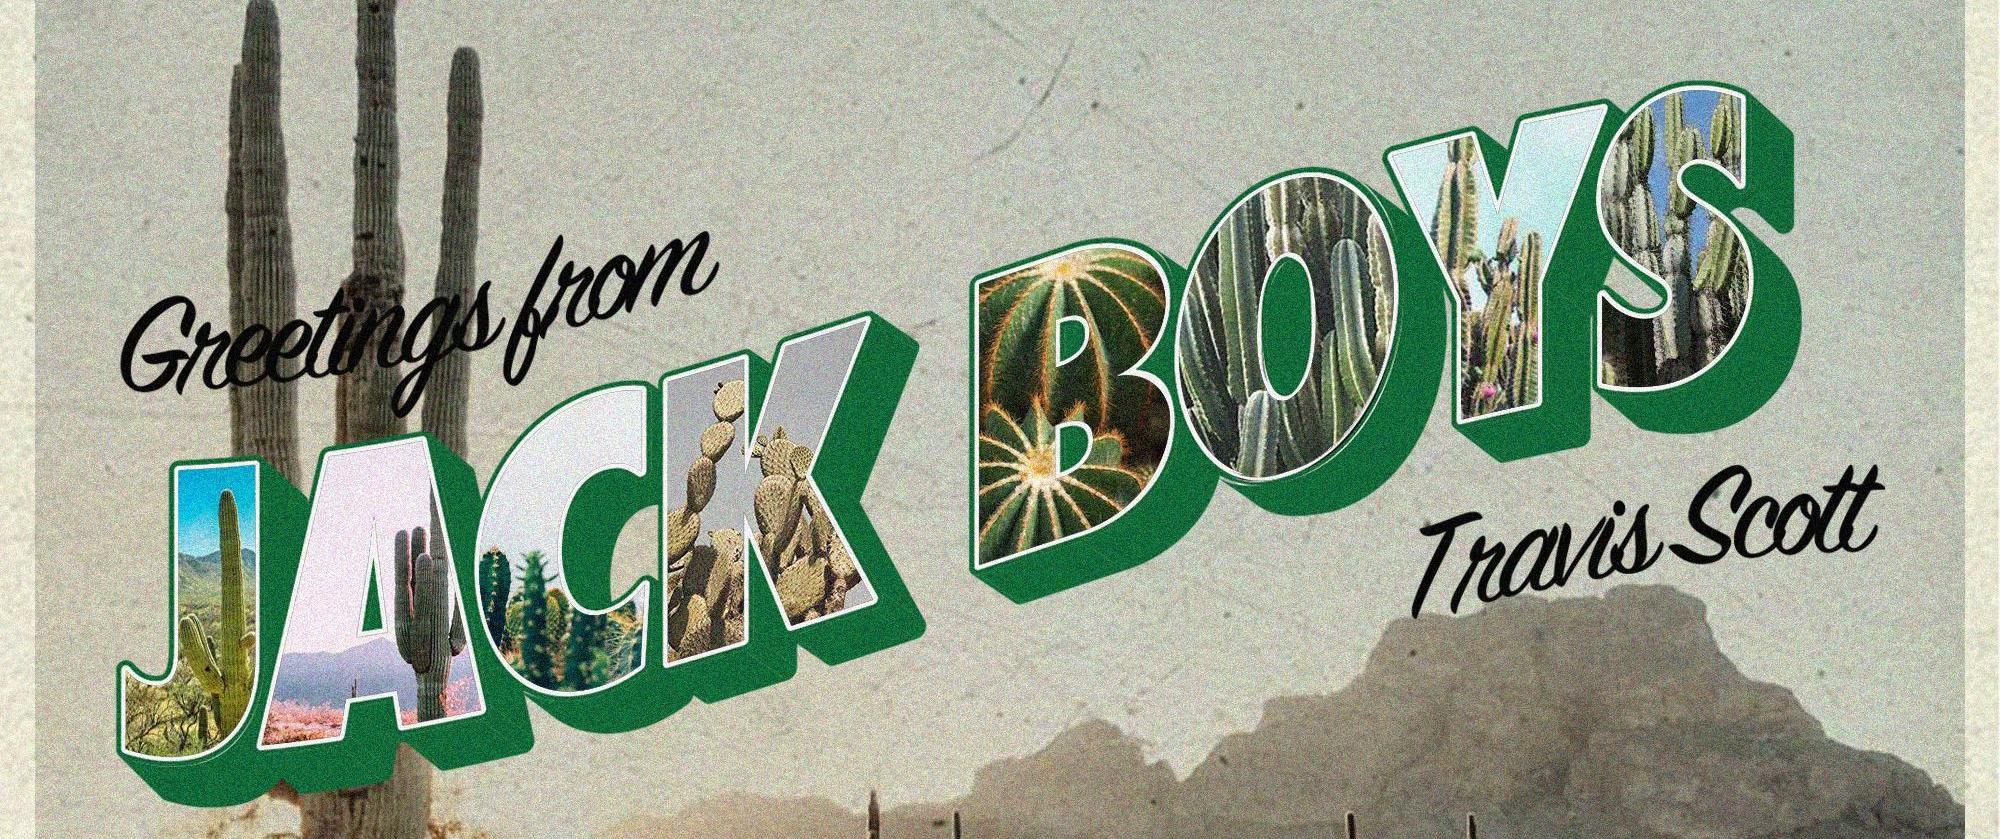 Album JACKBOYS - JACKBOYS, Travis Scott